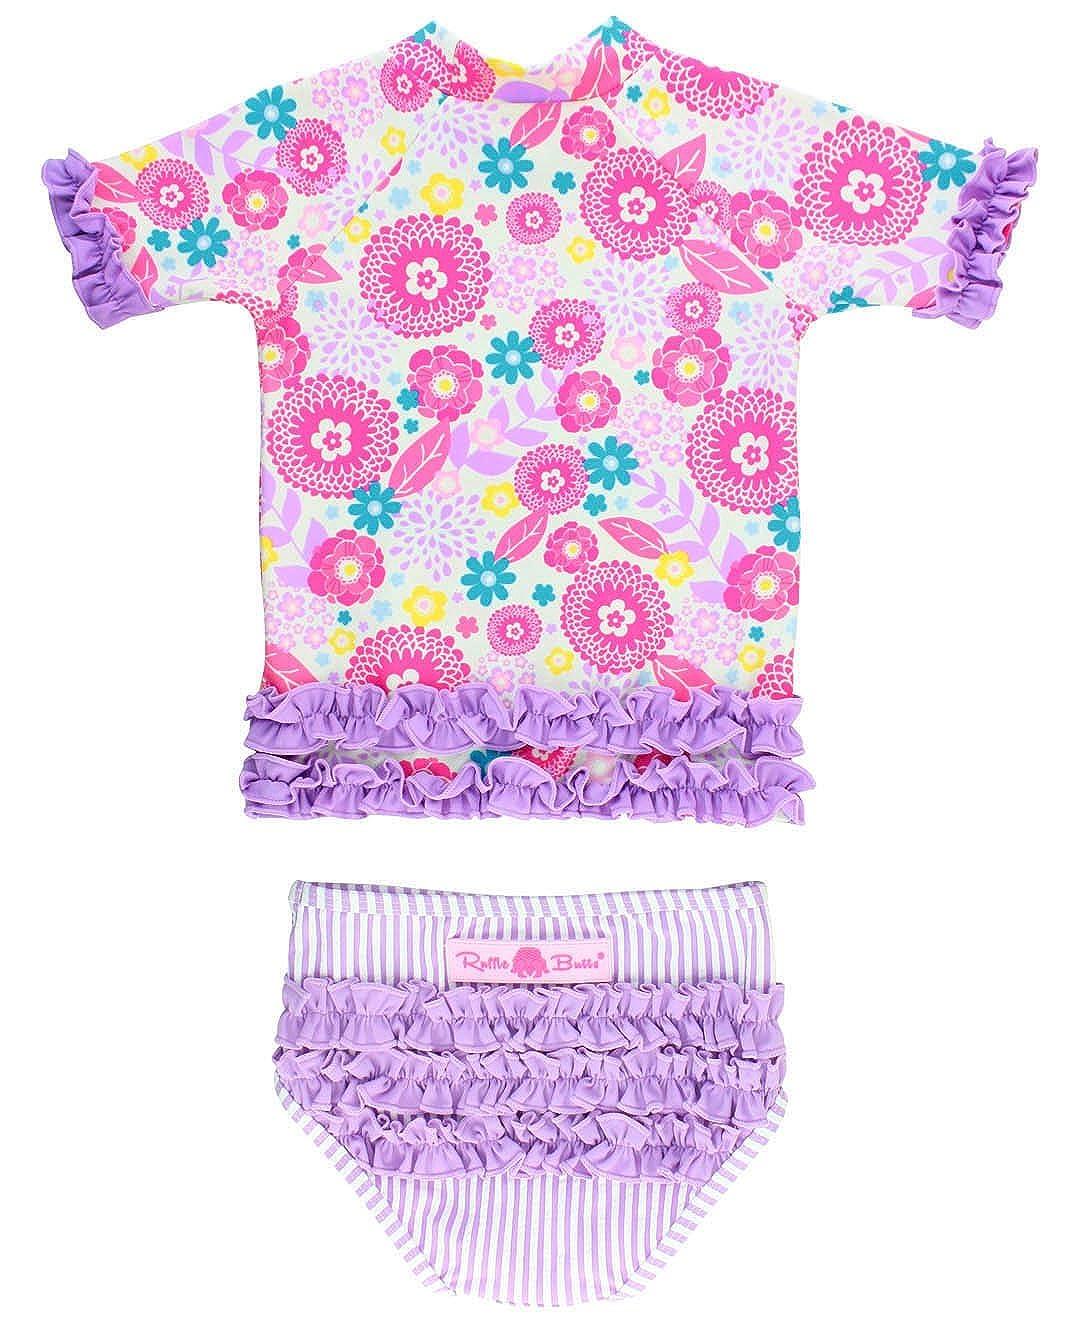 RuffleButts Little Girls Rash Guard 2-Piece Swimsuit Set - Floral Seersucker Bikini UPF 50+ Sun Protection RGSPUXX-SS00-TDLR